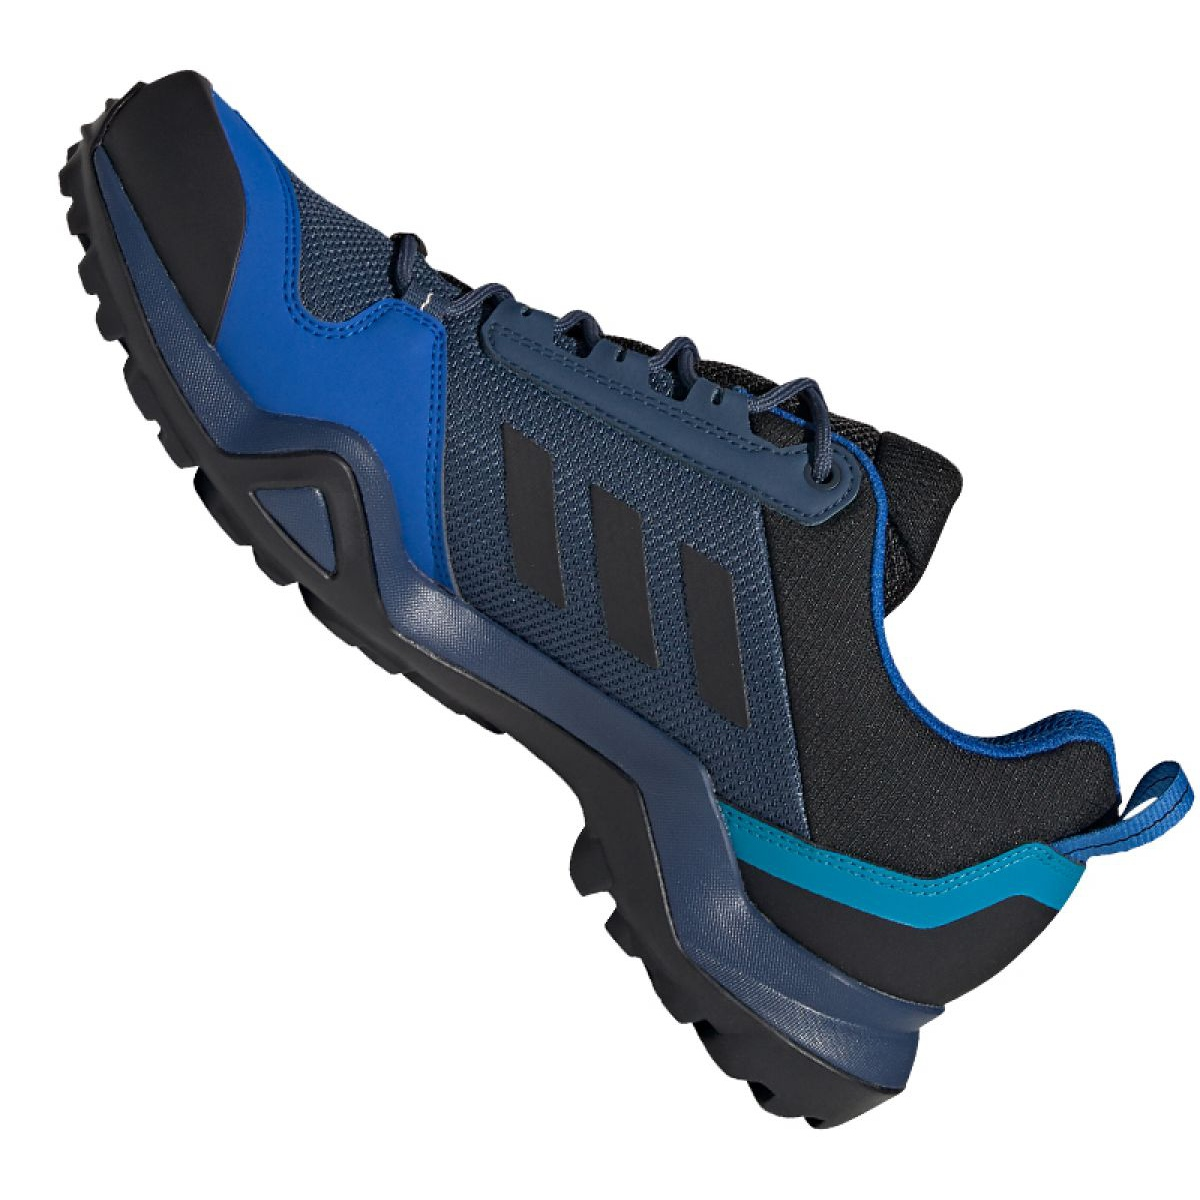 Adidas sapatos Terrex AX3 Gtx M EG6163 marinha